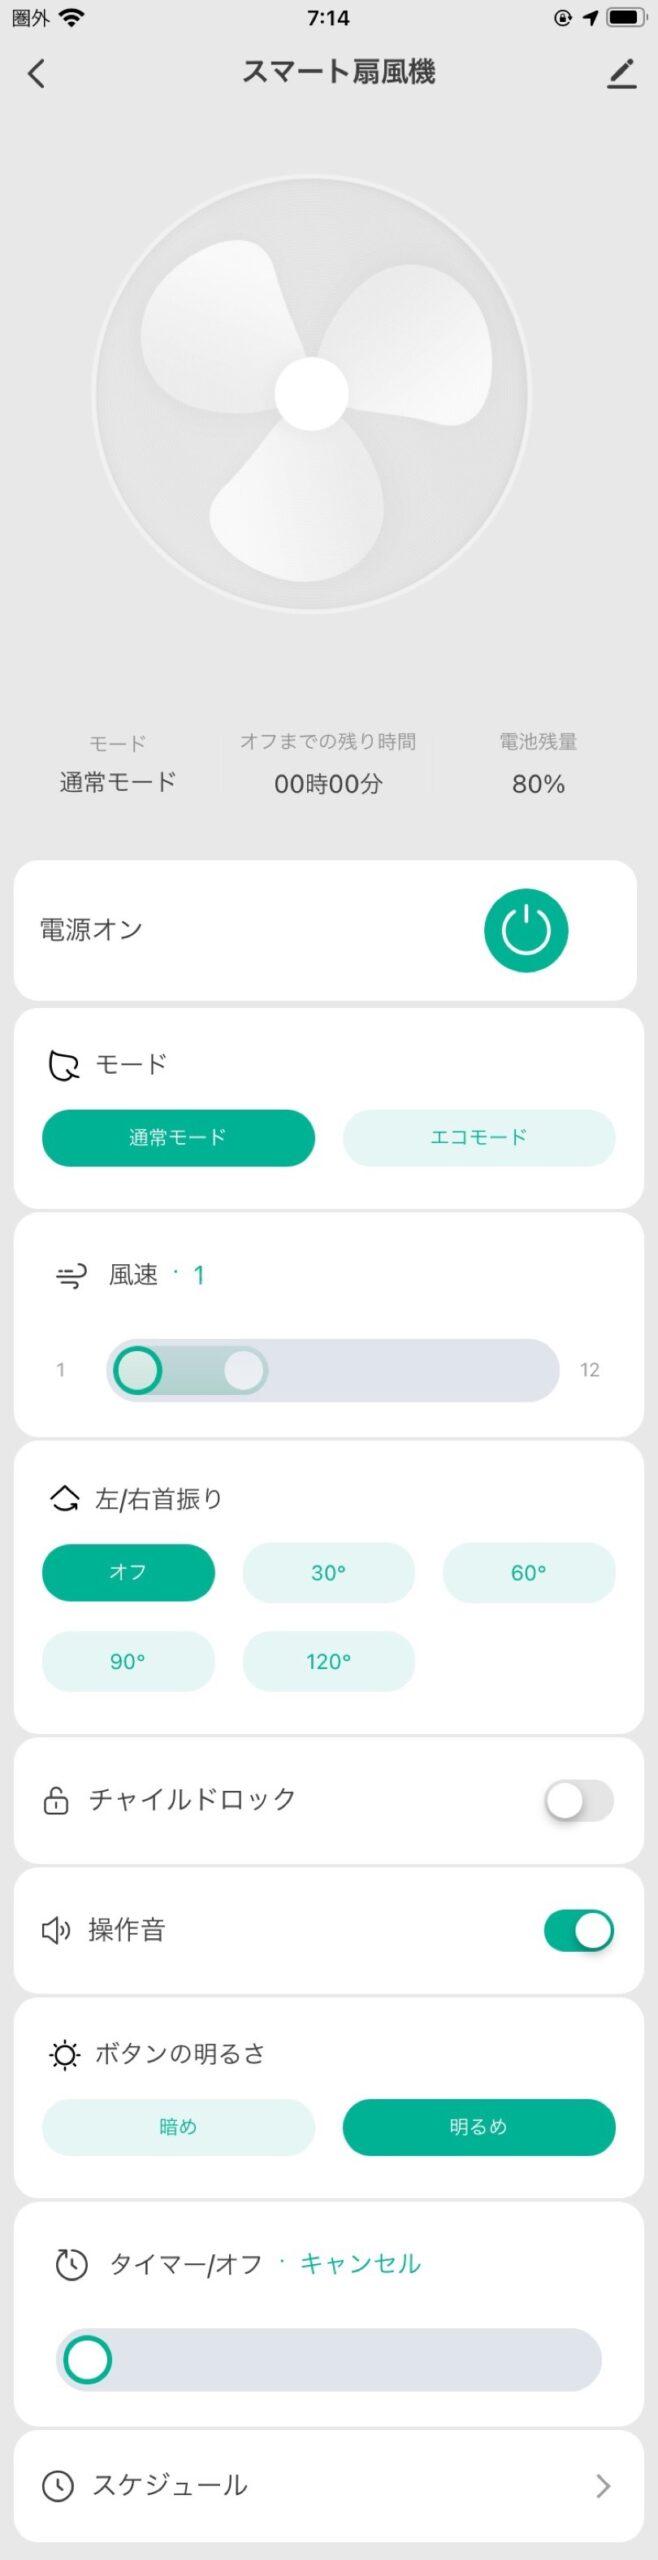 +Styleスマート扇風機 アプリの操作機能